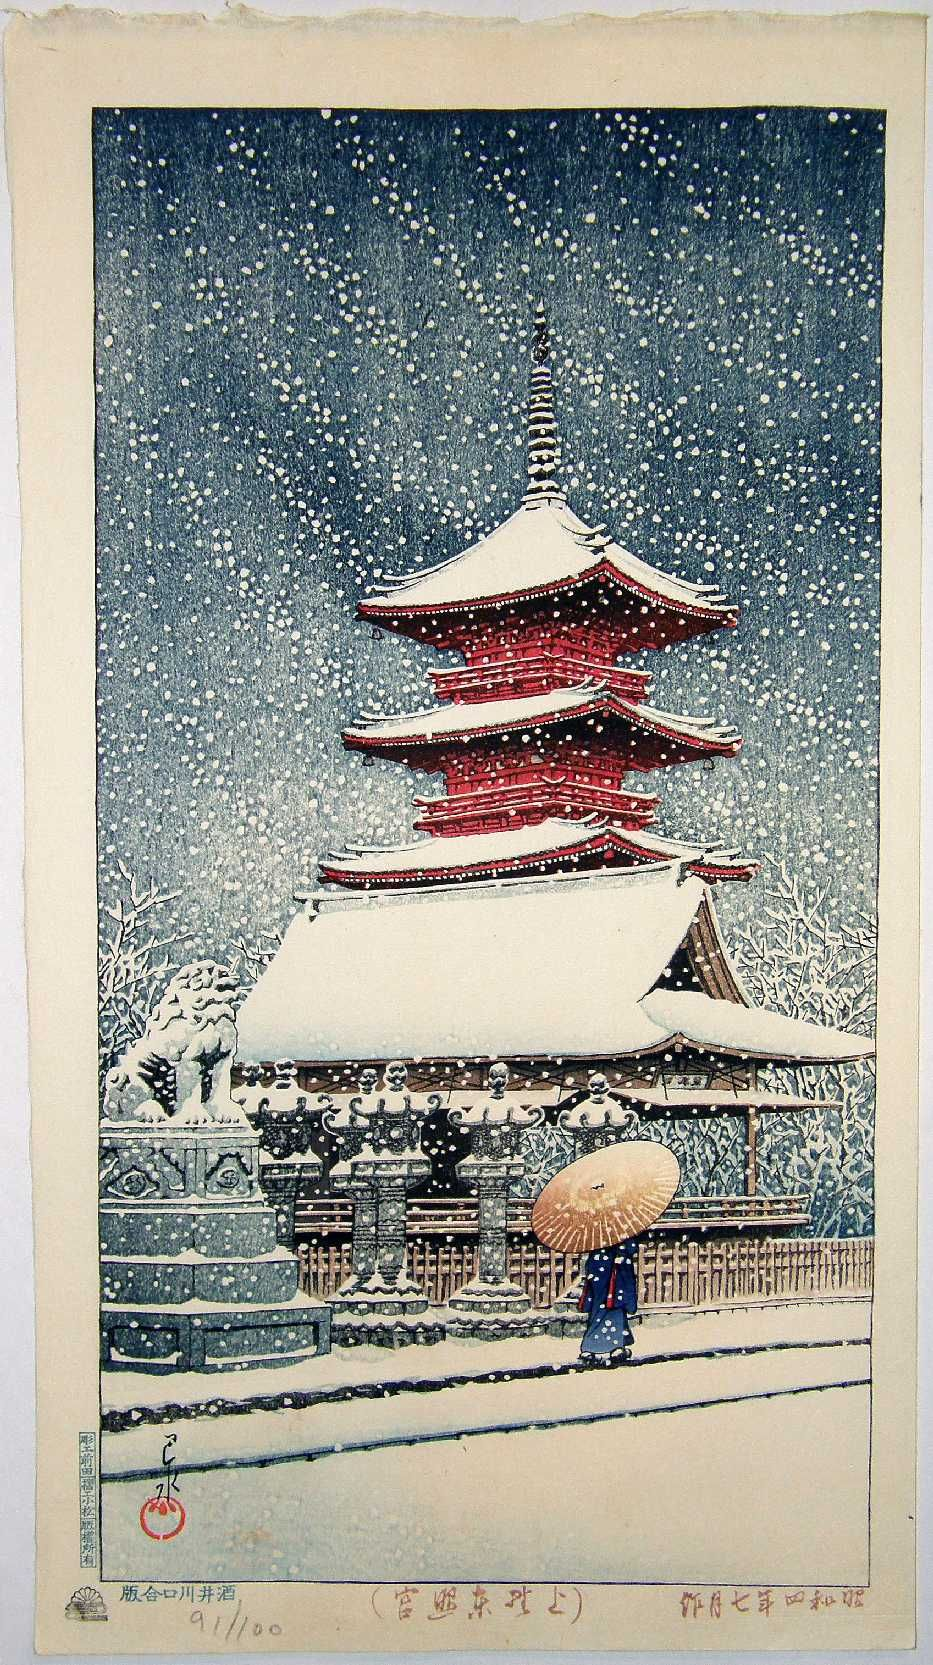 KAWASE Hasui(川瀬 巴水 Japanese,1883-1957) Snow at Ueno ...